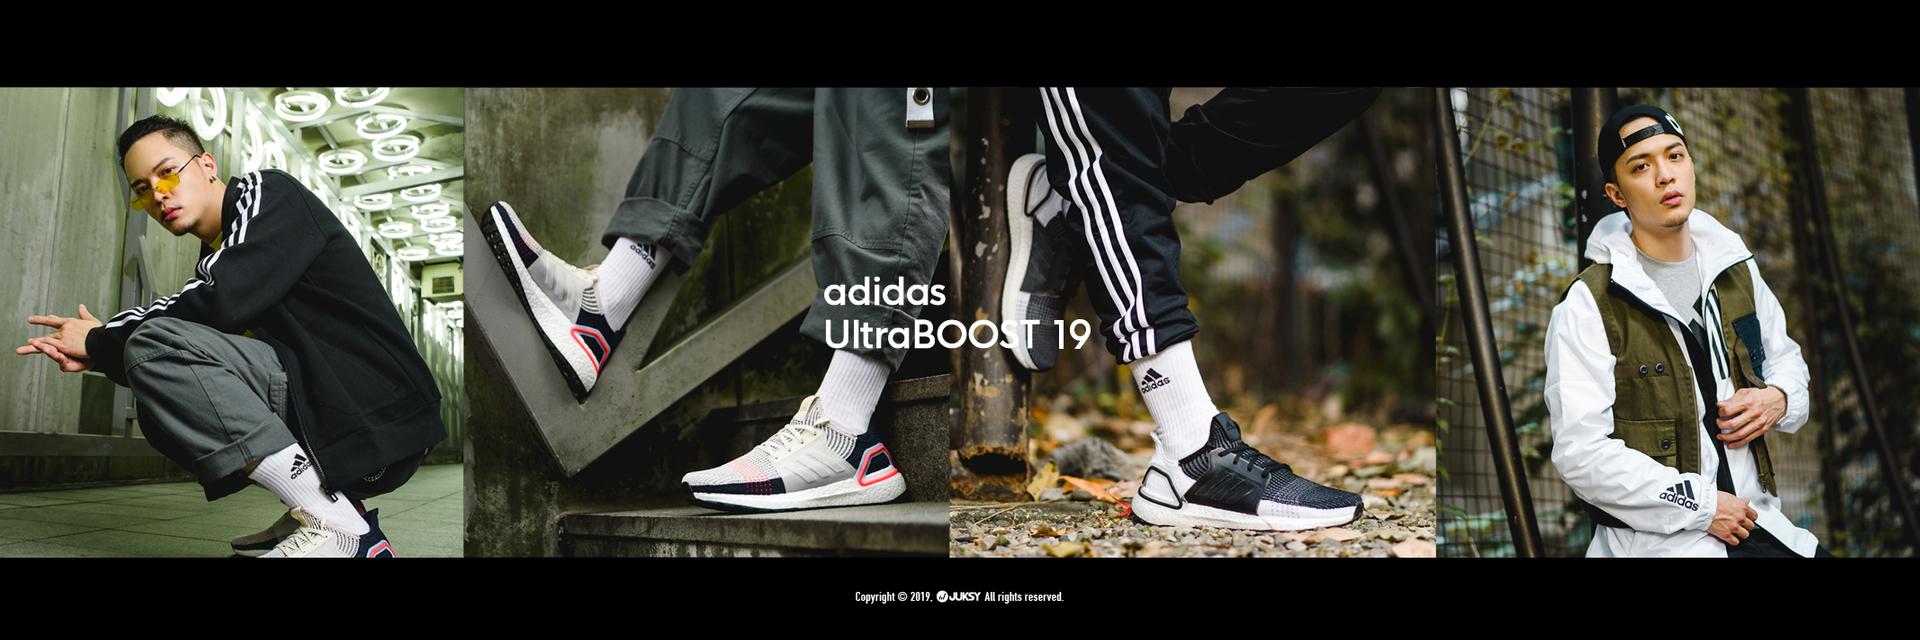 R&B 全能《天菜》無限進化!J.Sheon 演繹最新 adidas Ultraboost 19,絕佳腳感創造「Fusion Look」!